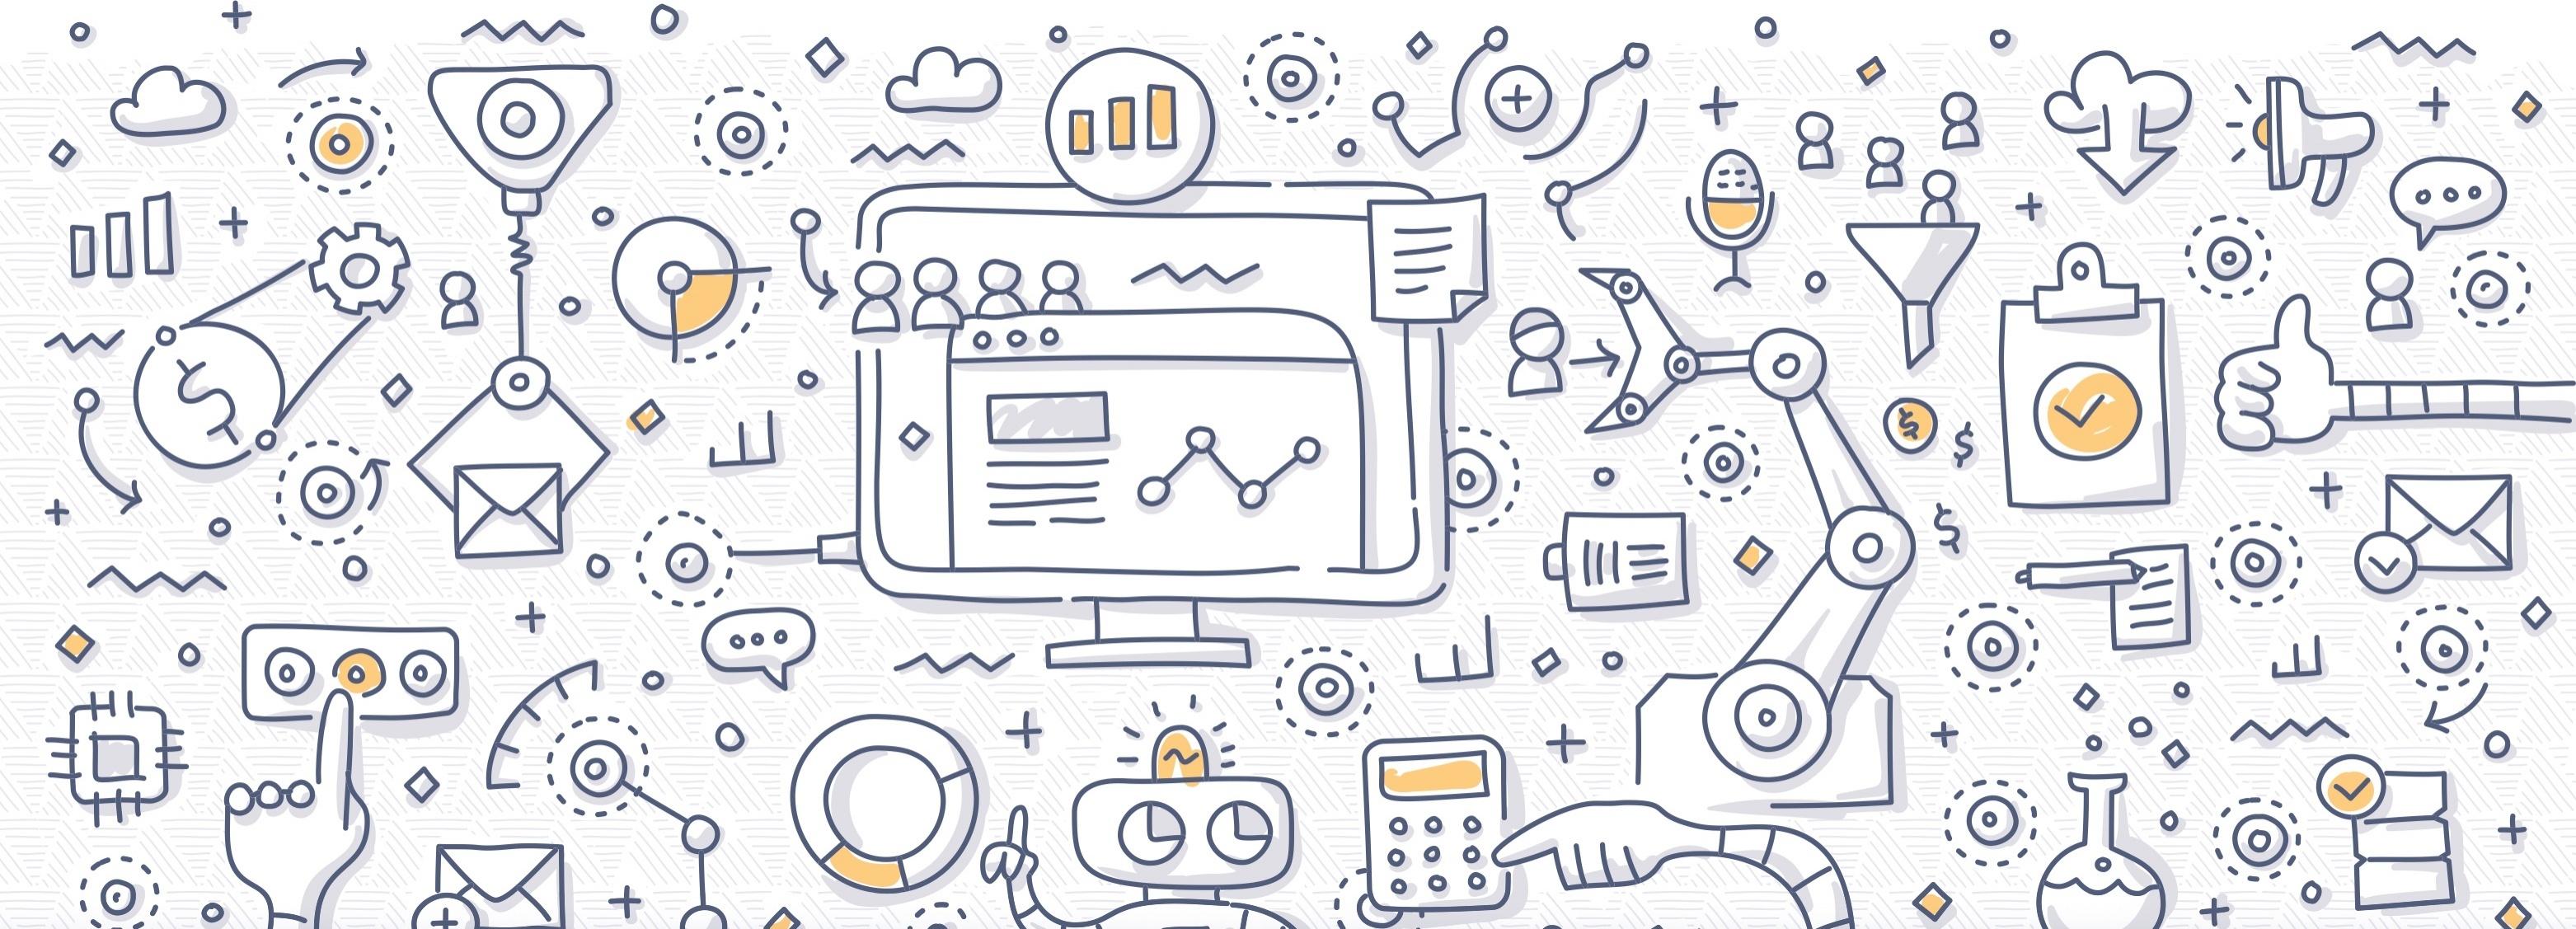 marketing_automation_illustration.jpg